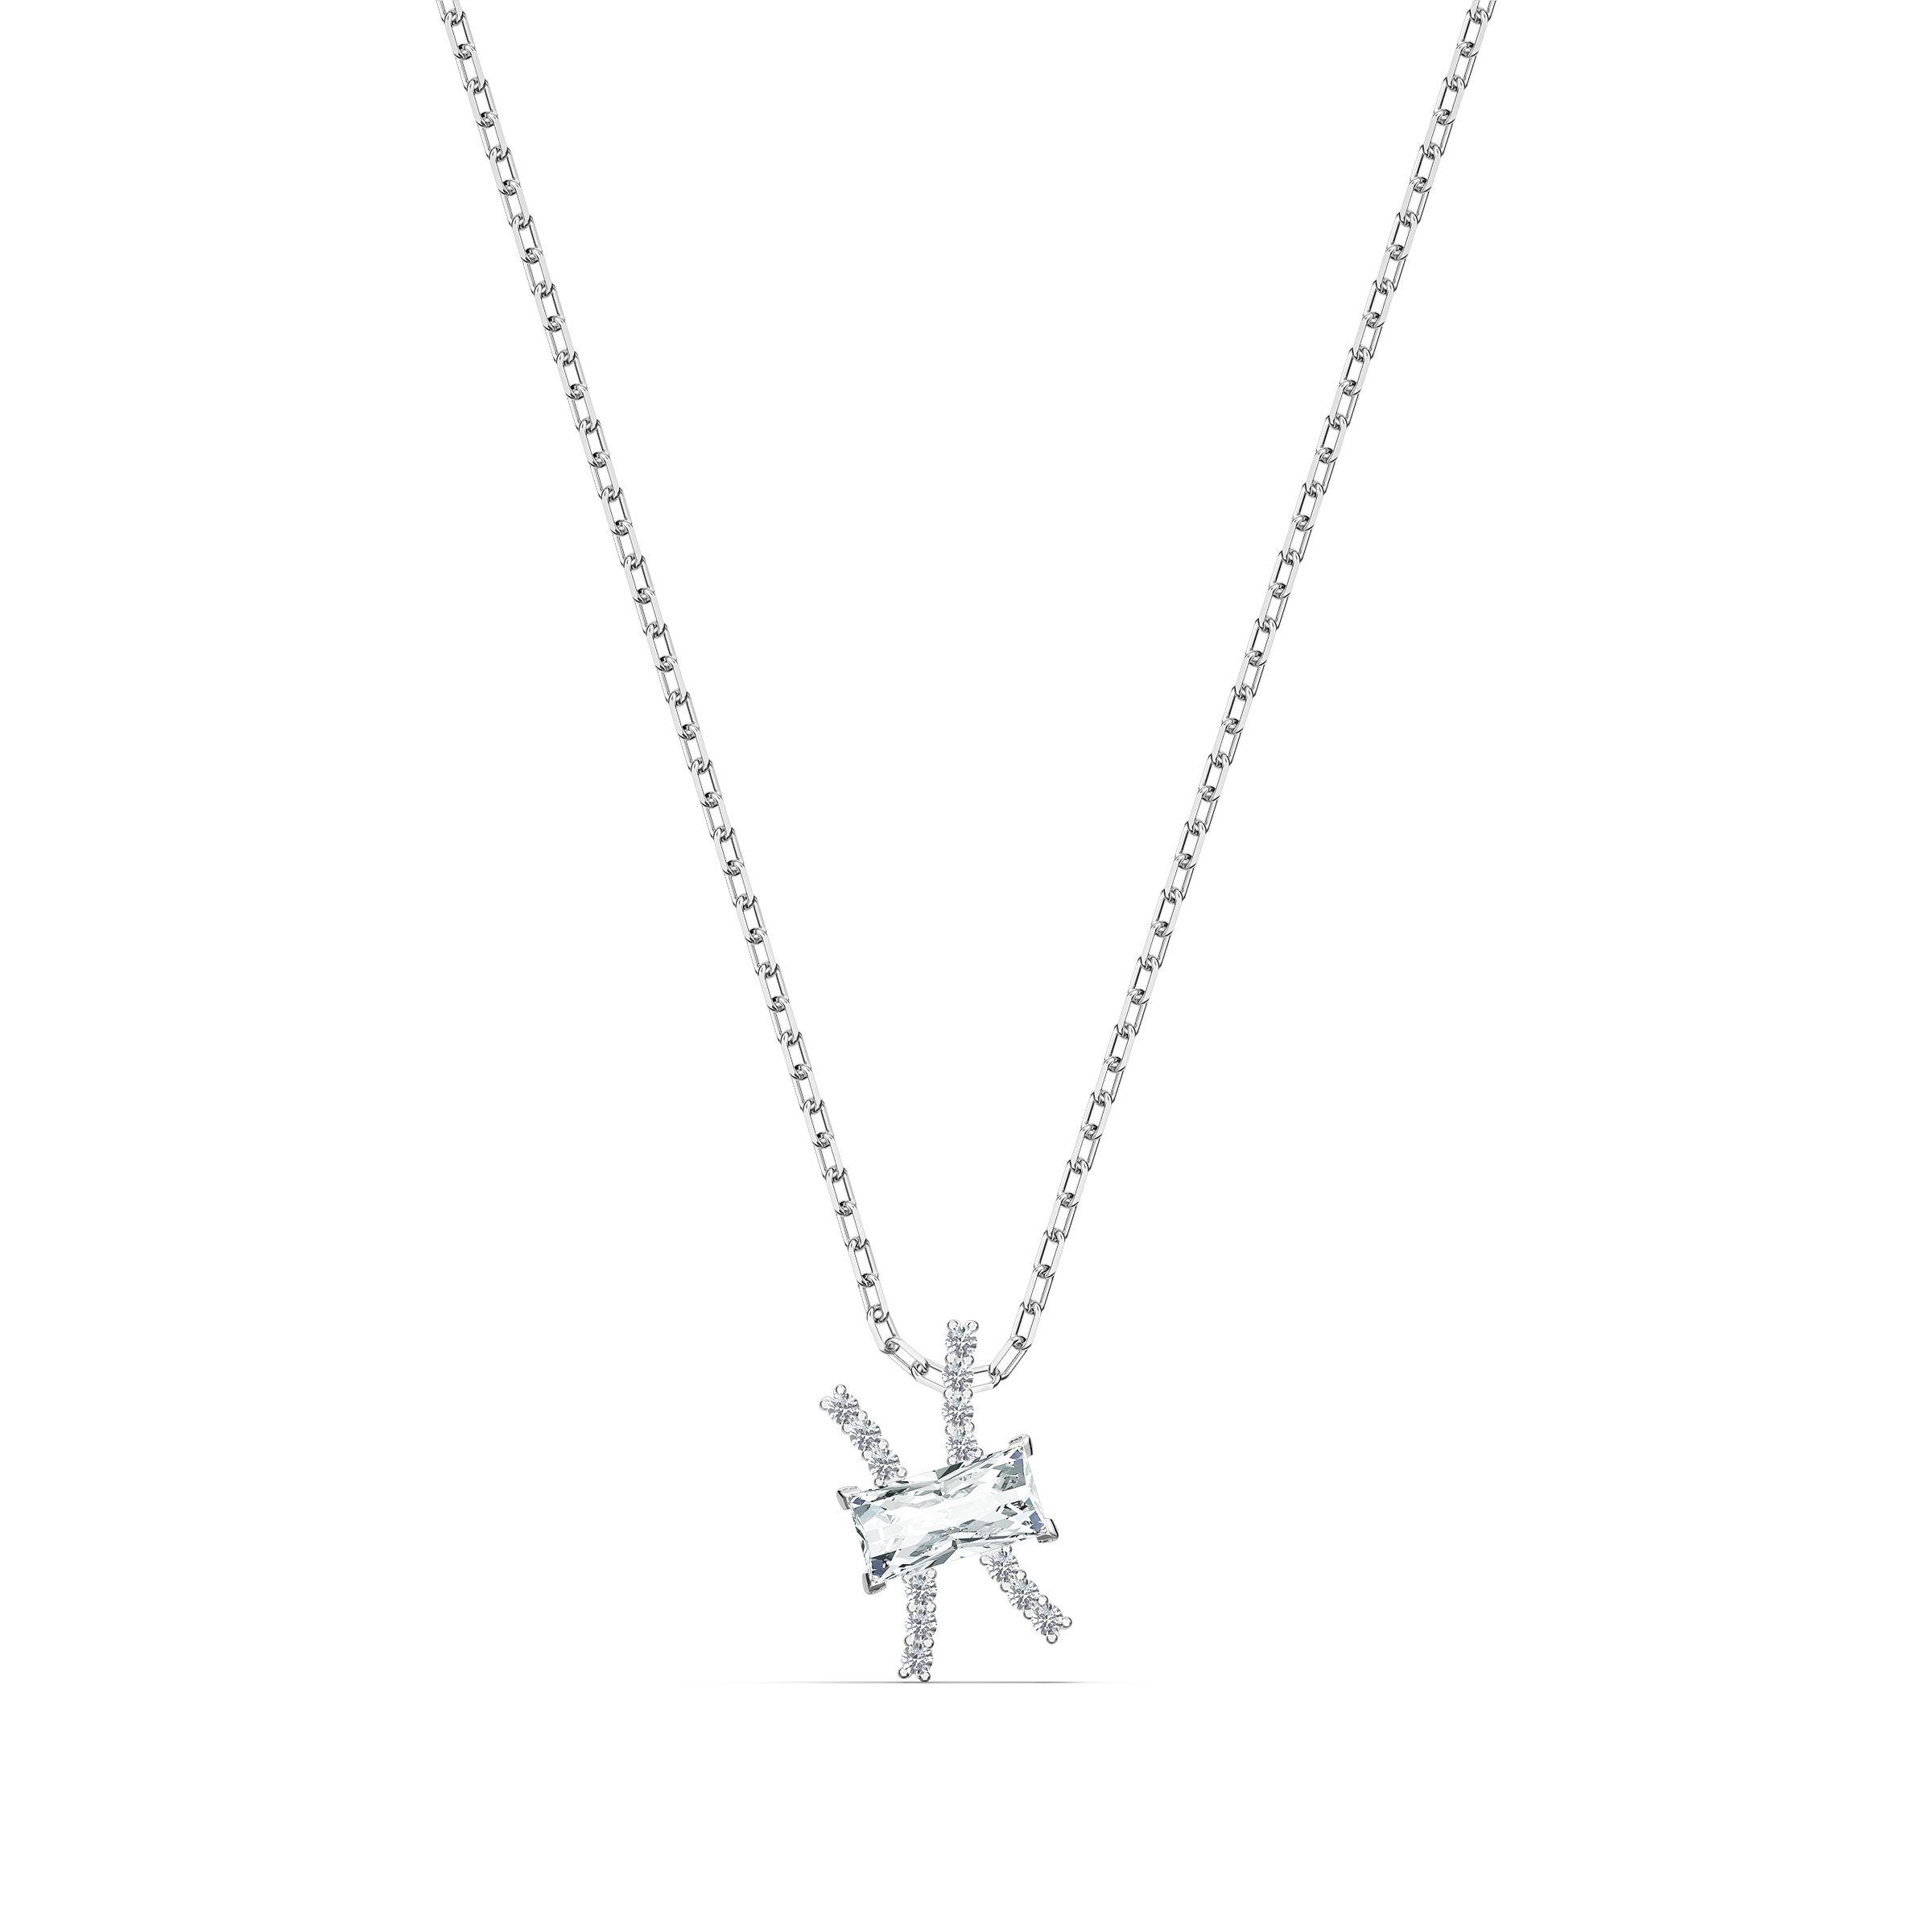 Pendentif Zodiac II, Poissons, blanc, finition mix de métal, Swarovski